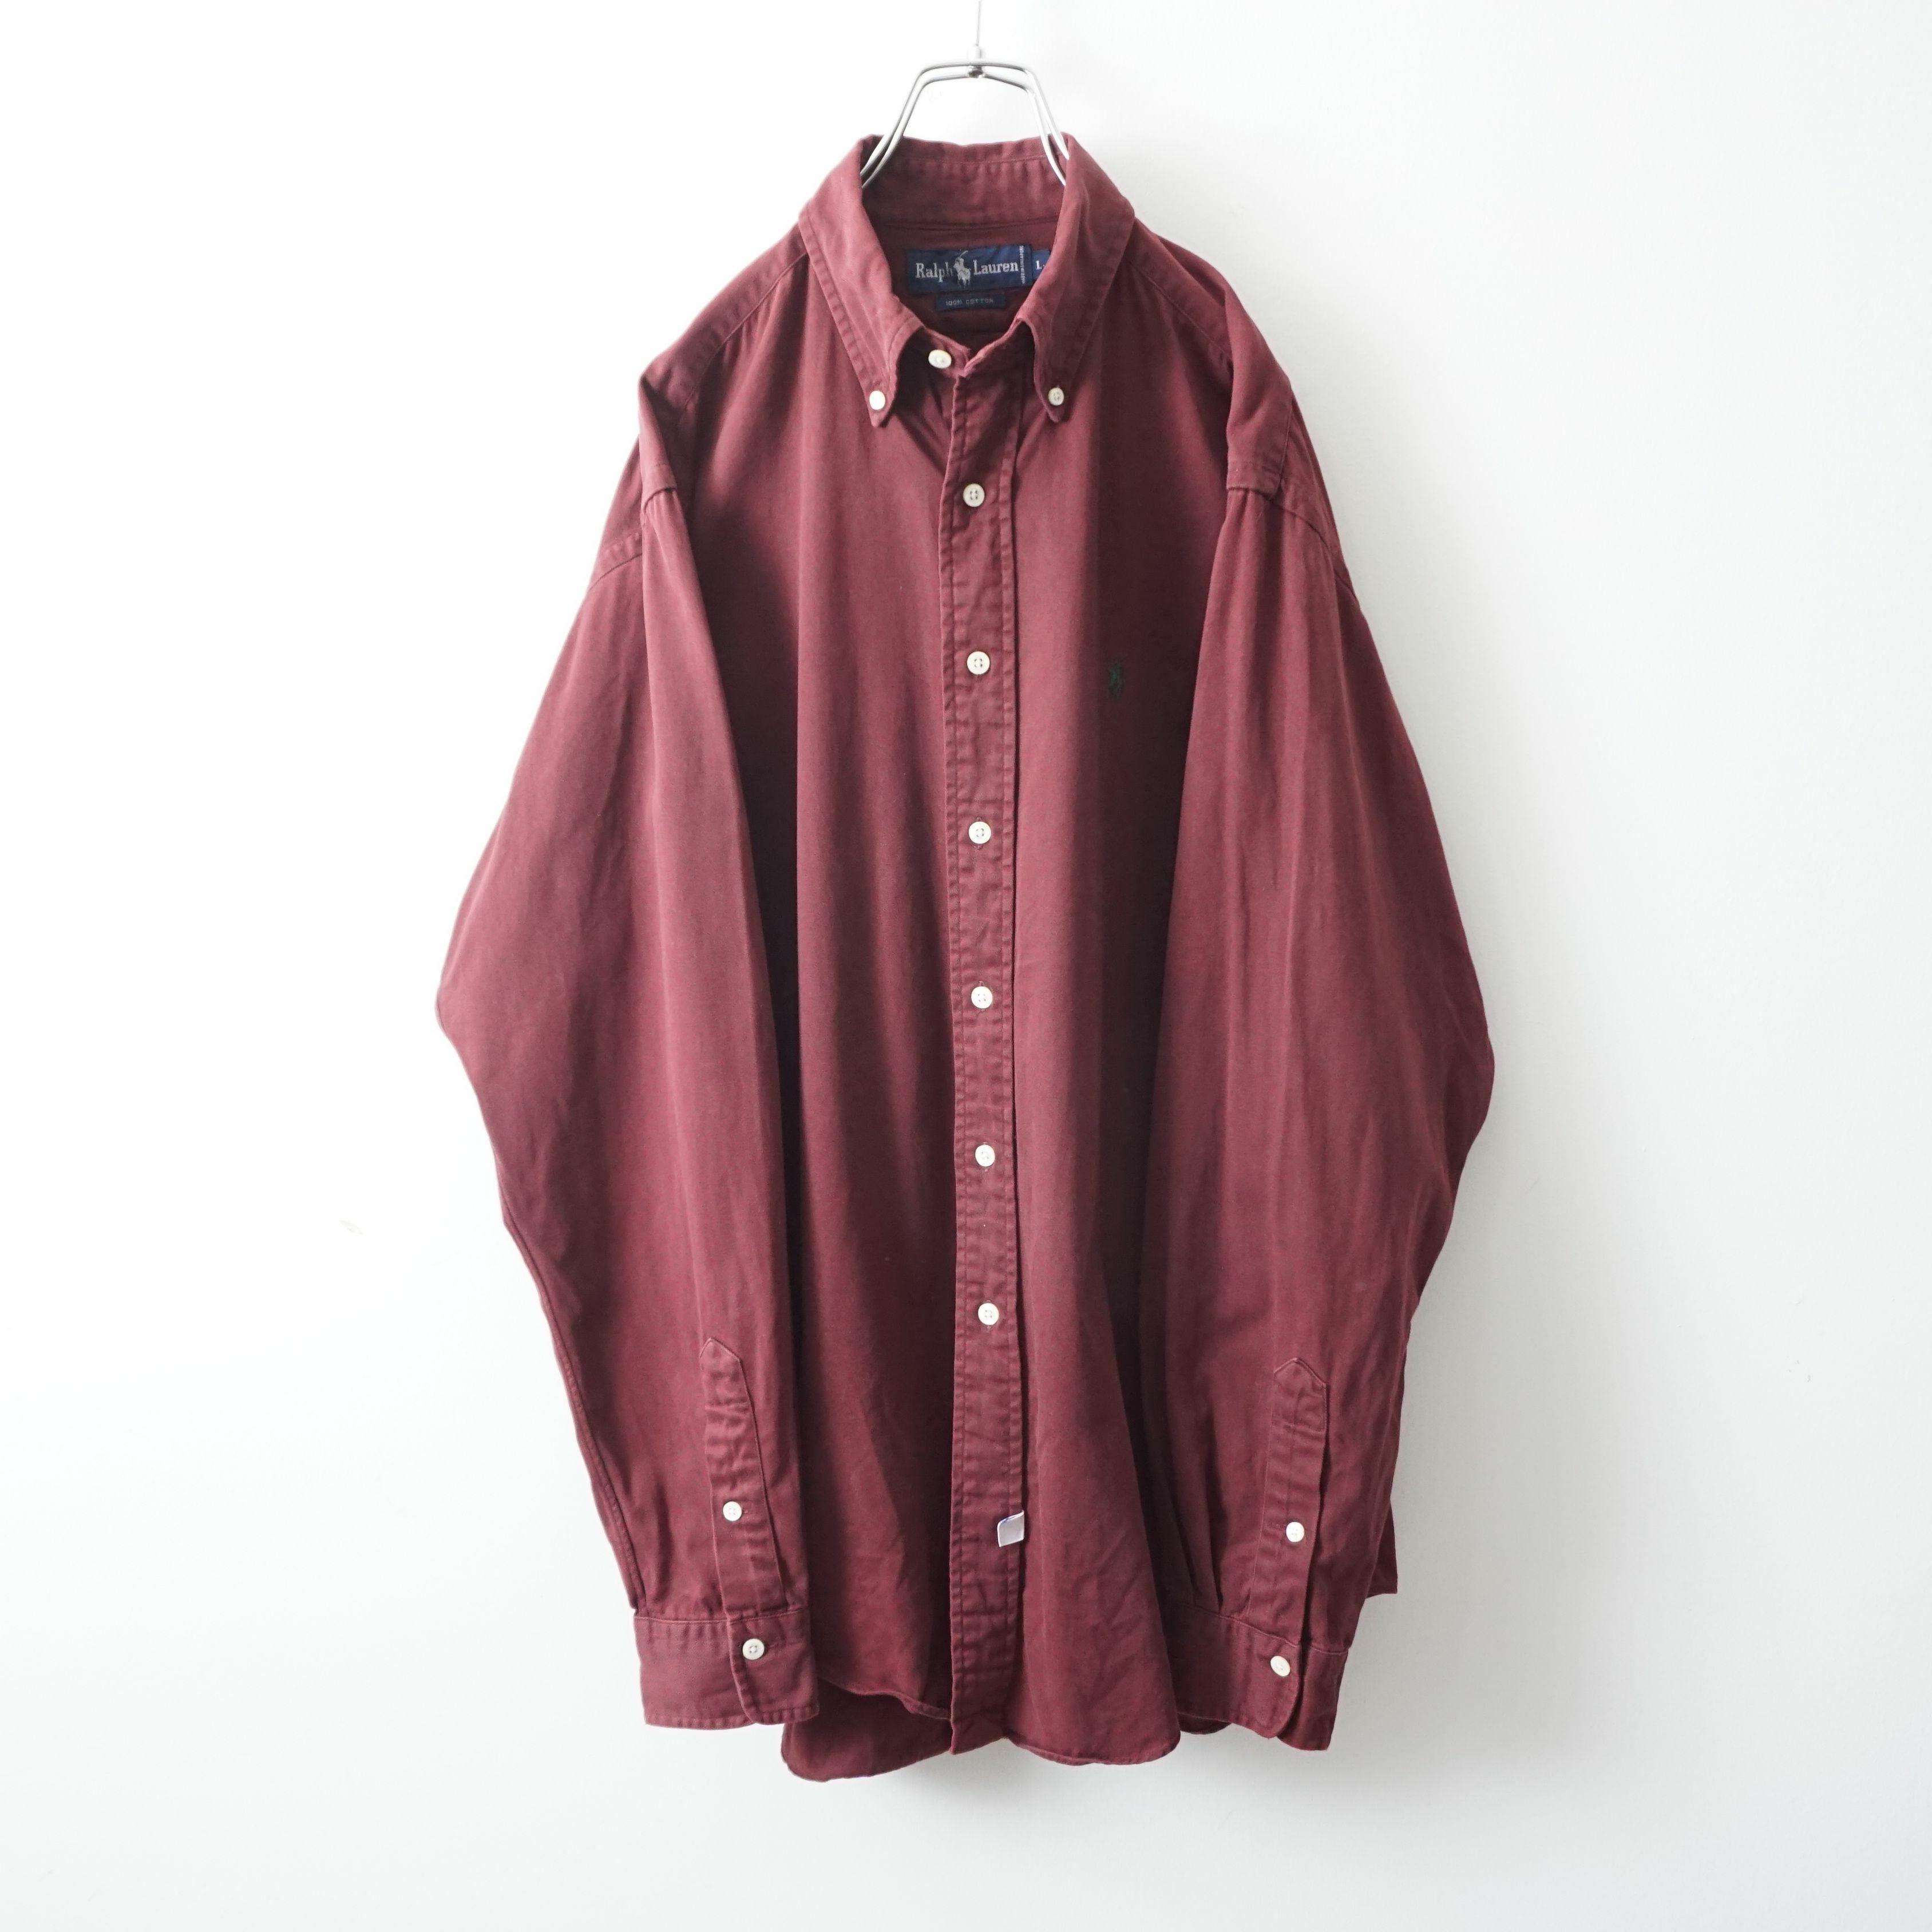 Ralph Lauren bordeaux button-down shirt